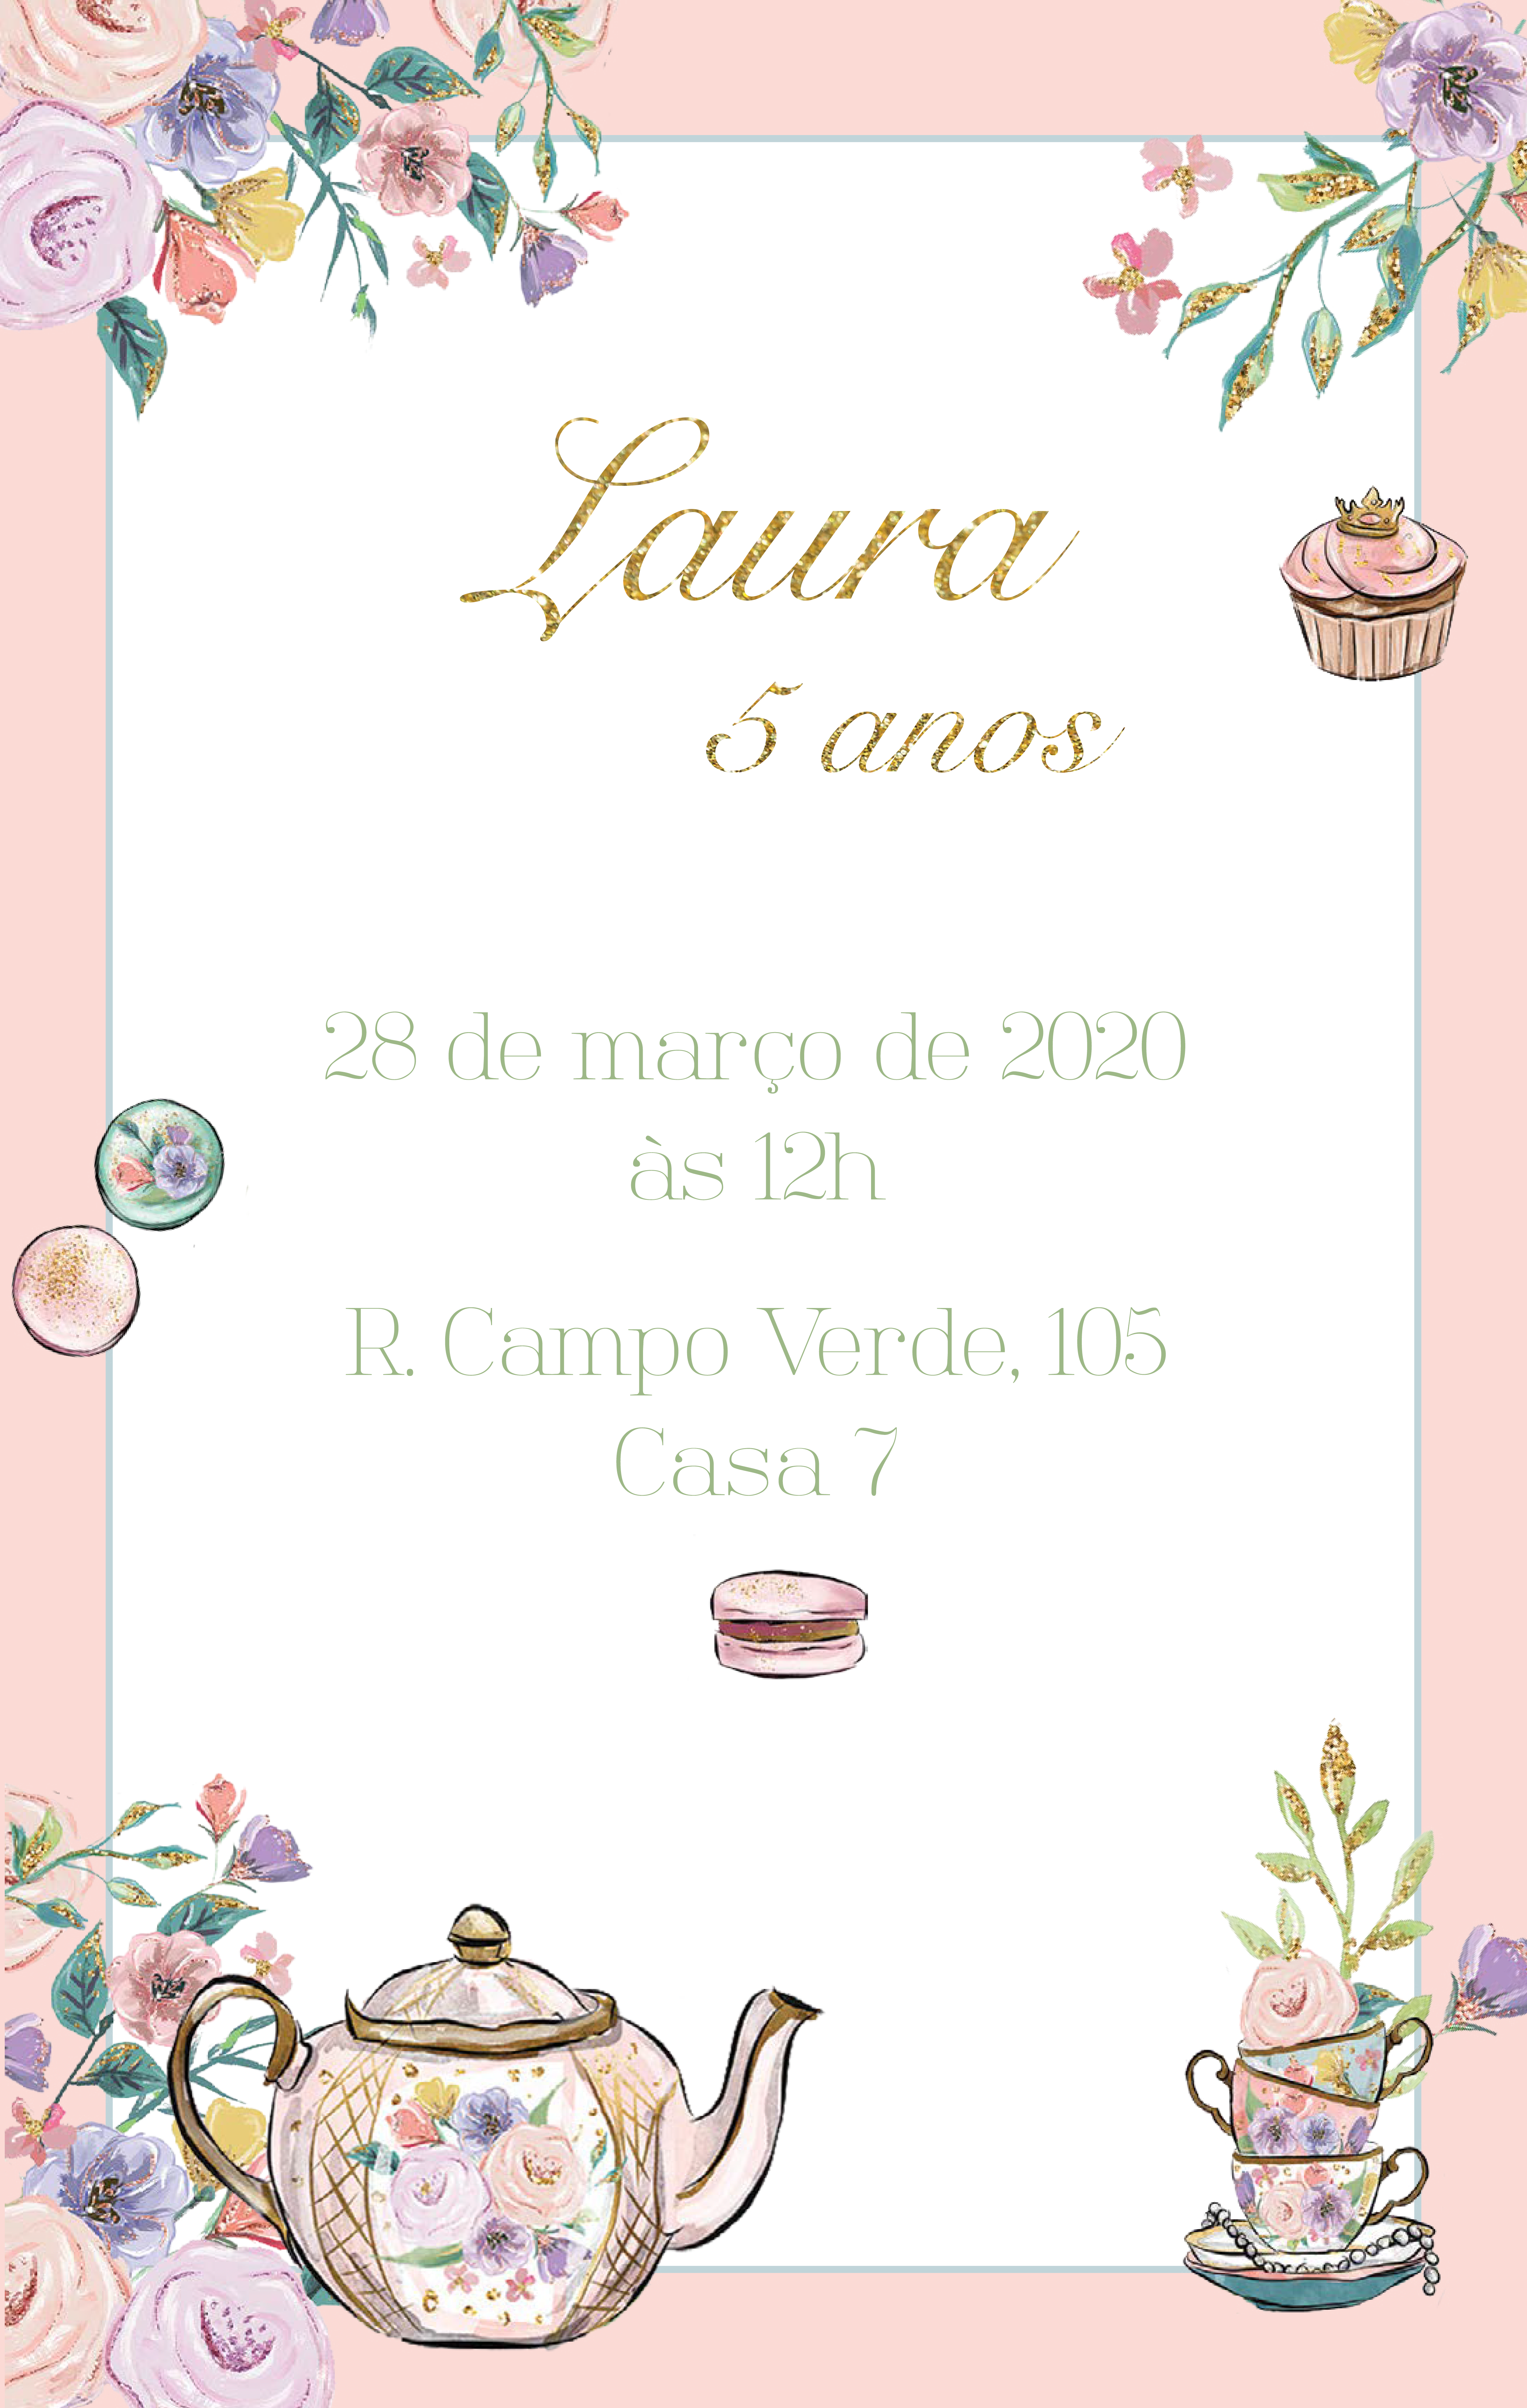 Laura-5-anos-nova-data